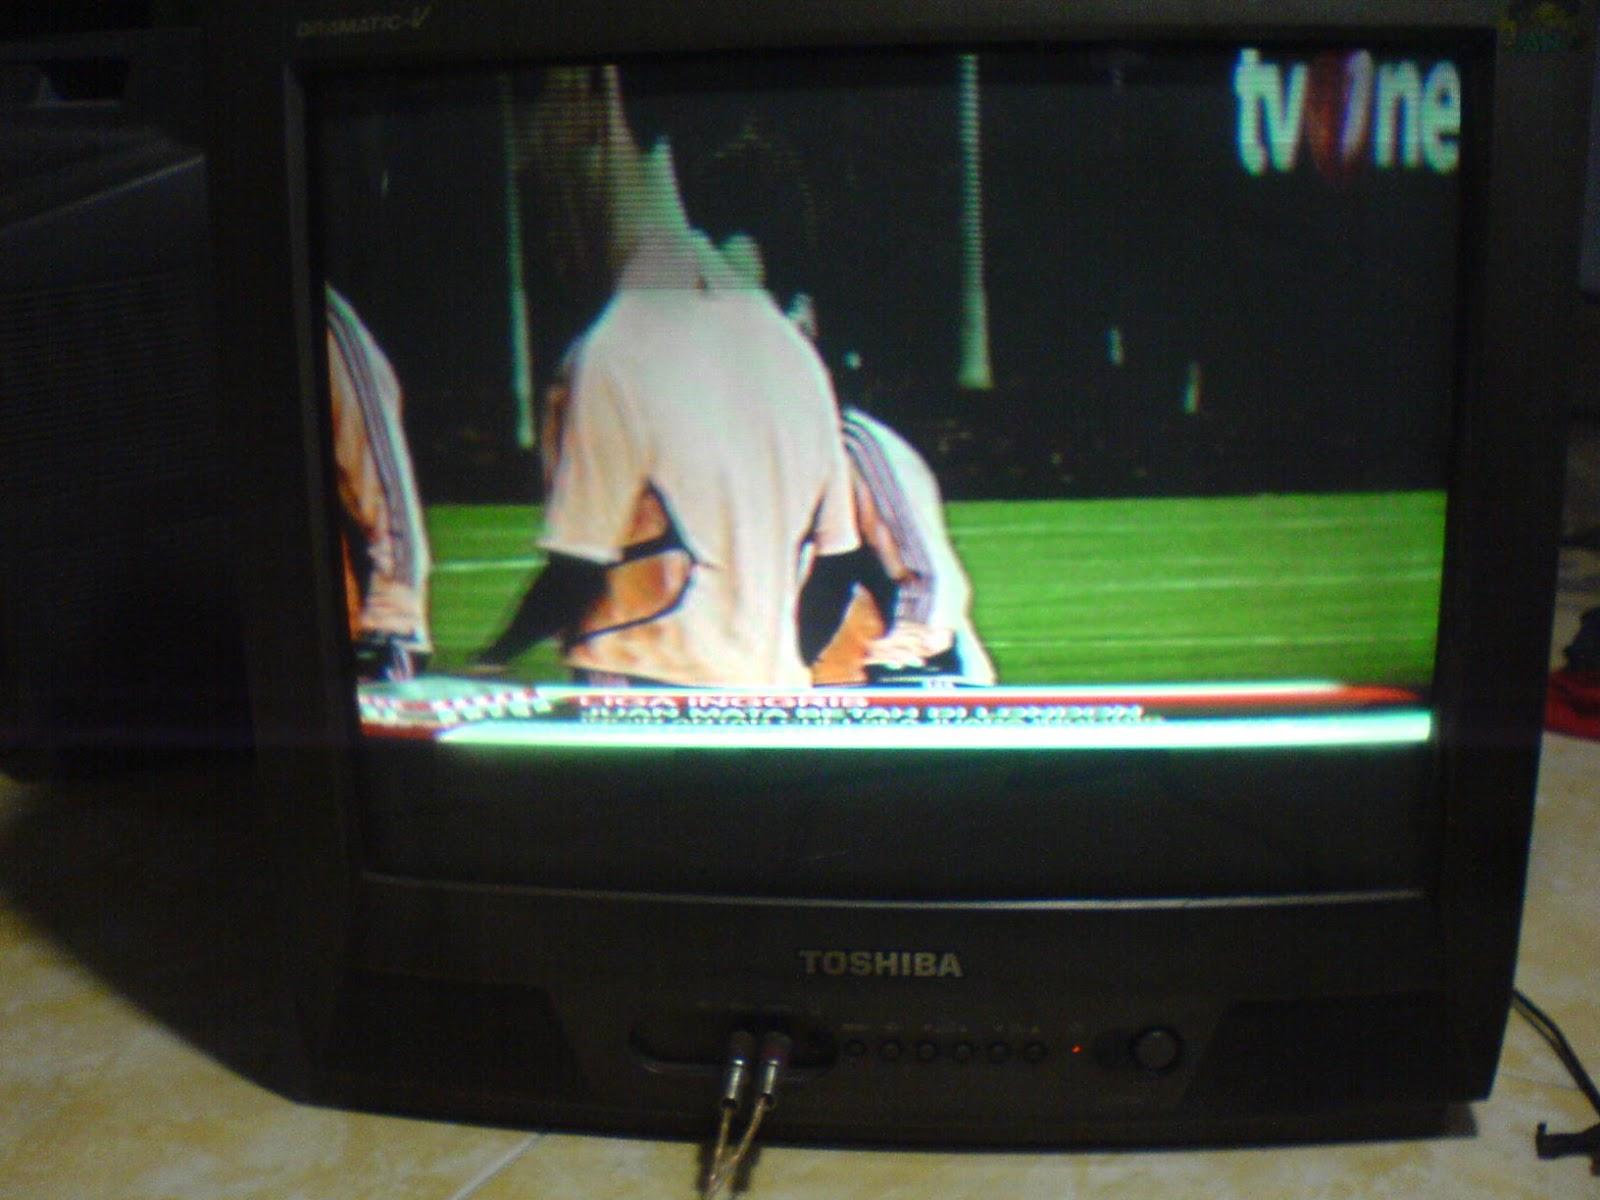 TV Toshiba Cacal Vertikal Ndory Servis